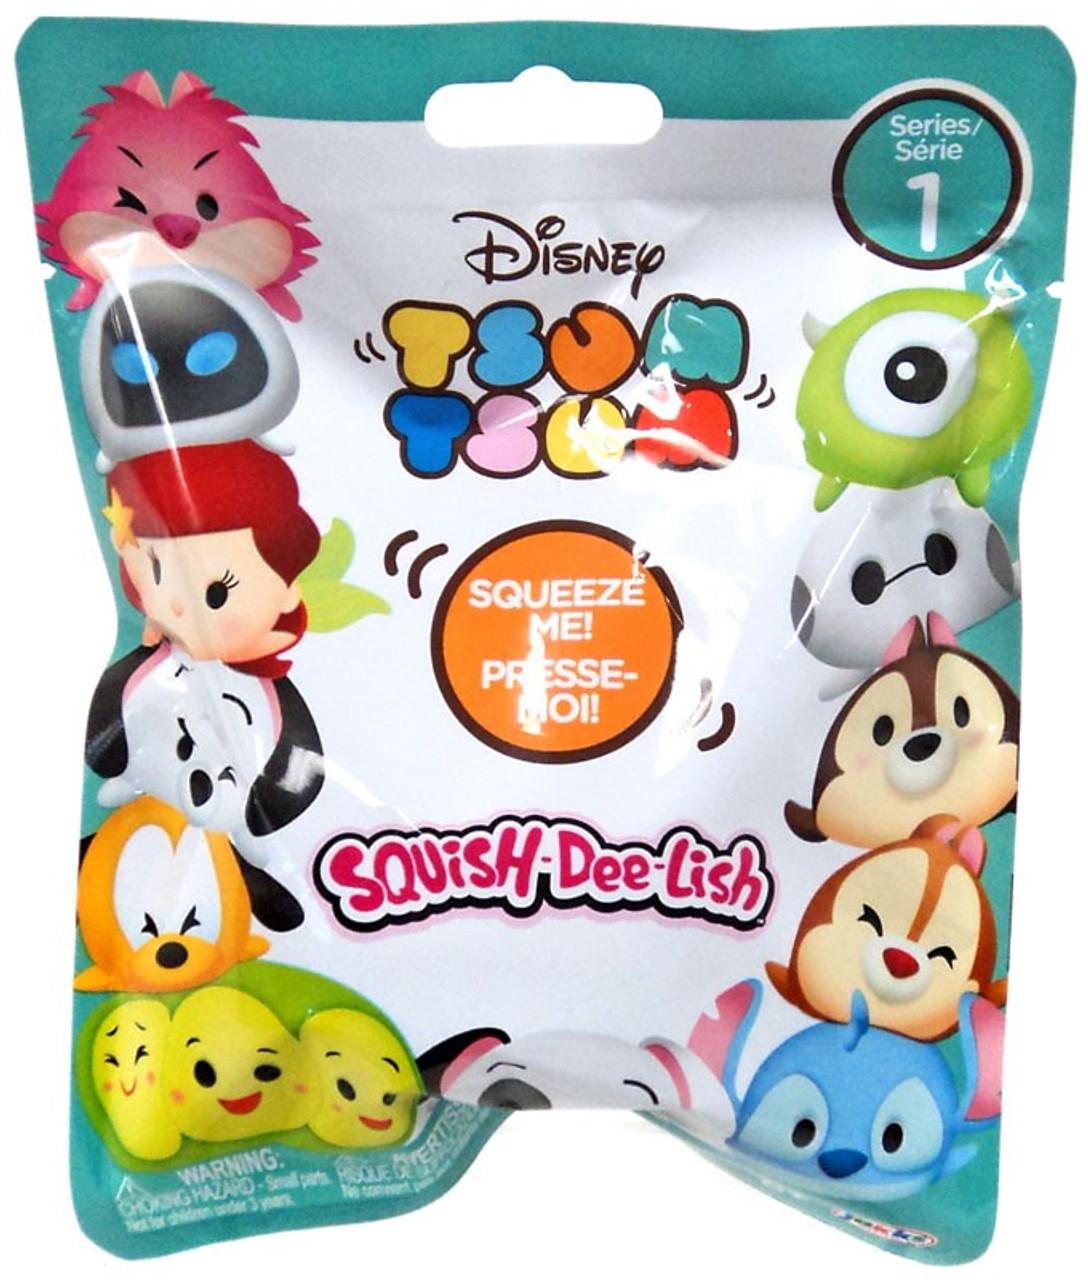 Disney Squish-Dee-Lish Tsum Tsum Series 1 Tsum Tsum Mystery Pack Jakks Pacific - ToyWiz